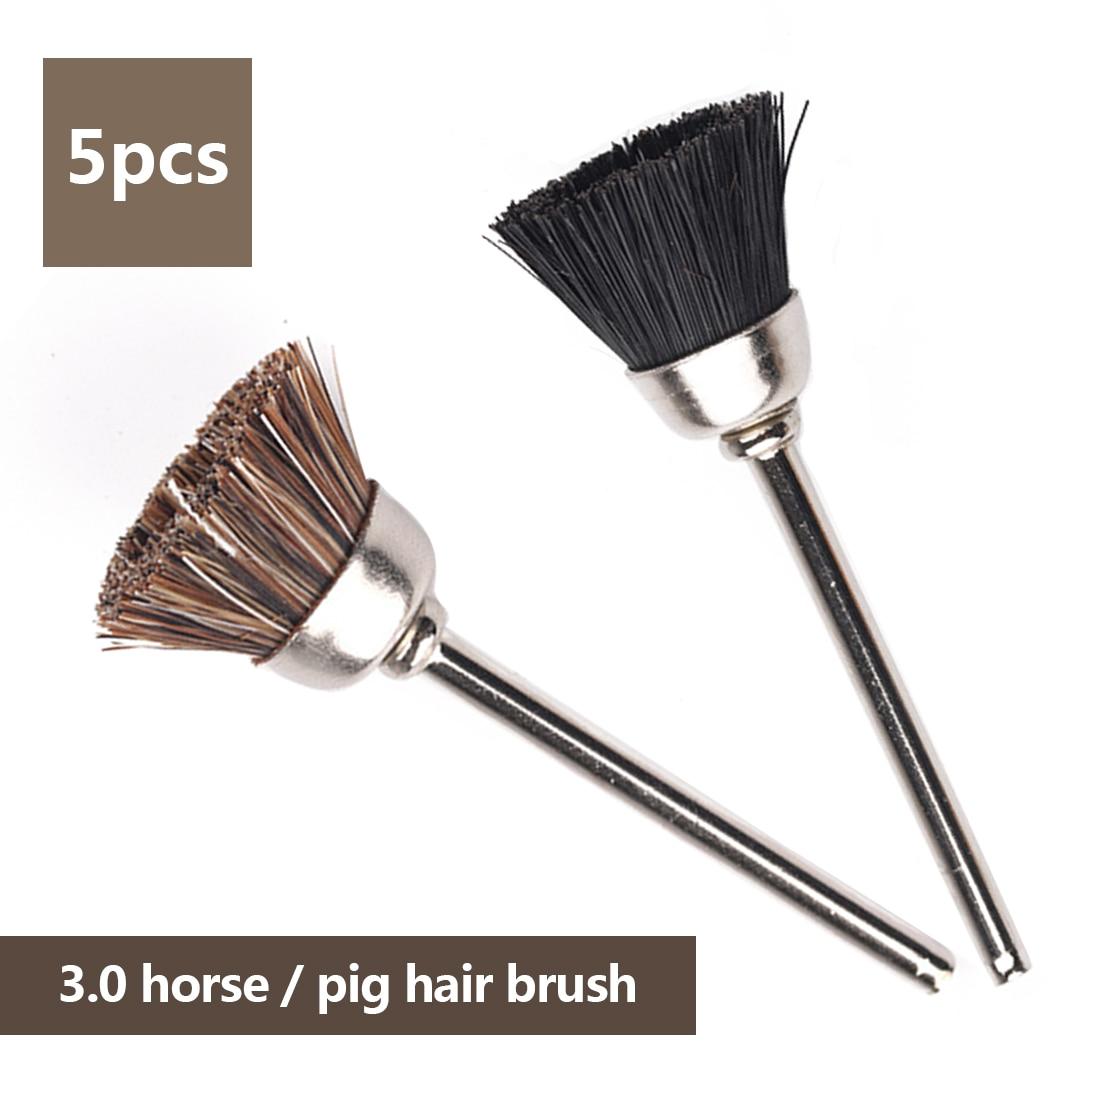 Dremel Accessories 5pc 3mm Diameter Soft Pig /Horse Hair Polishing Cup Brush Wheel Metal Buffing Polishing For Drill Rotary Tool